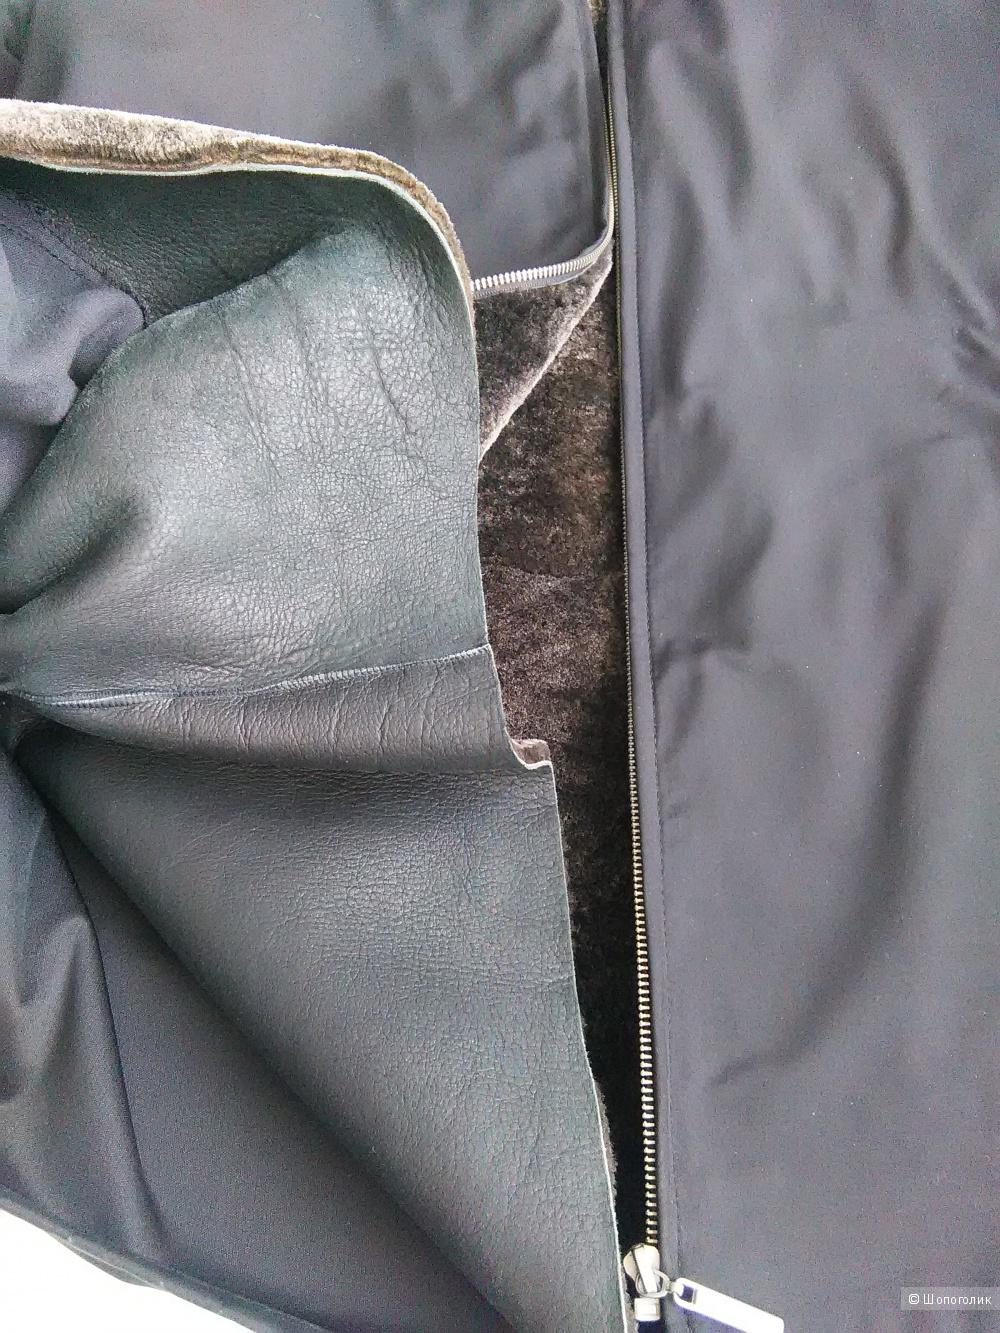 Куртка на натуральном меху LAGERFELD (Франция), р. 52-54, черная